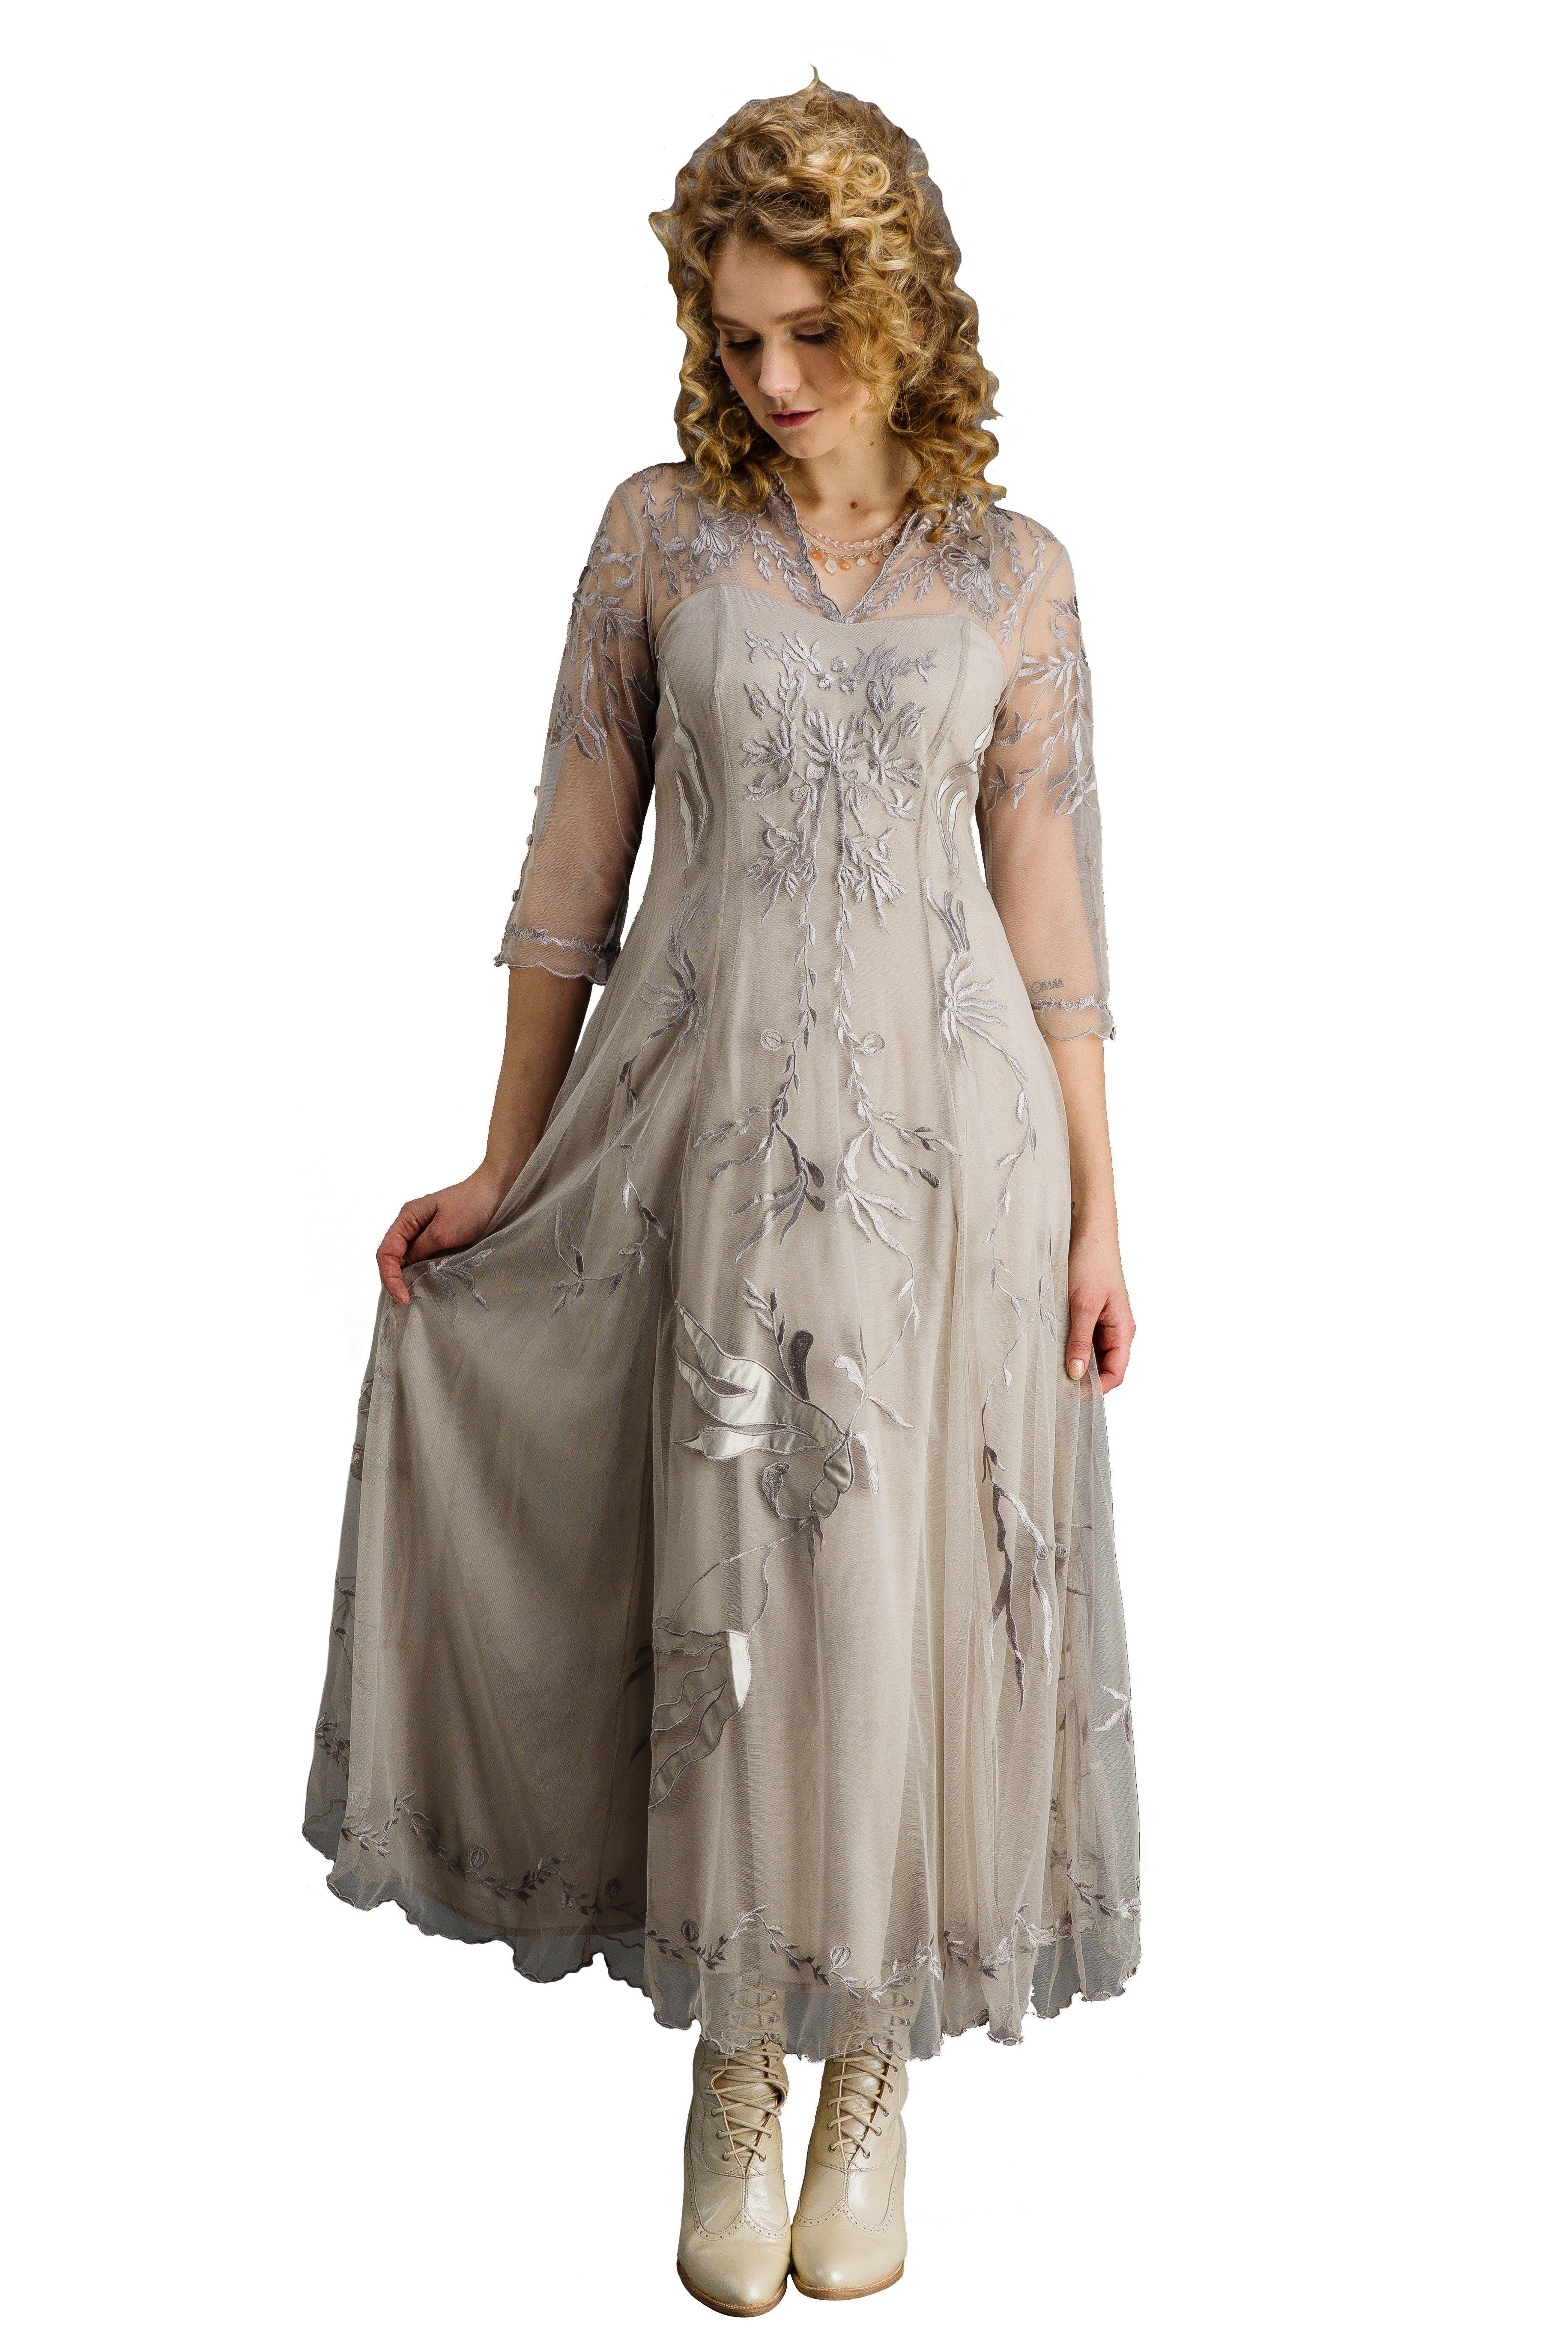 Elizabeth Vintage Style Wedding Gown in Silver/Grey by